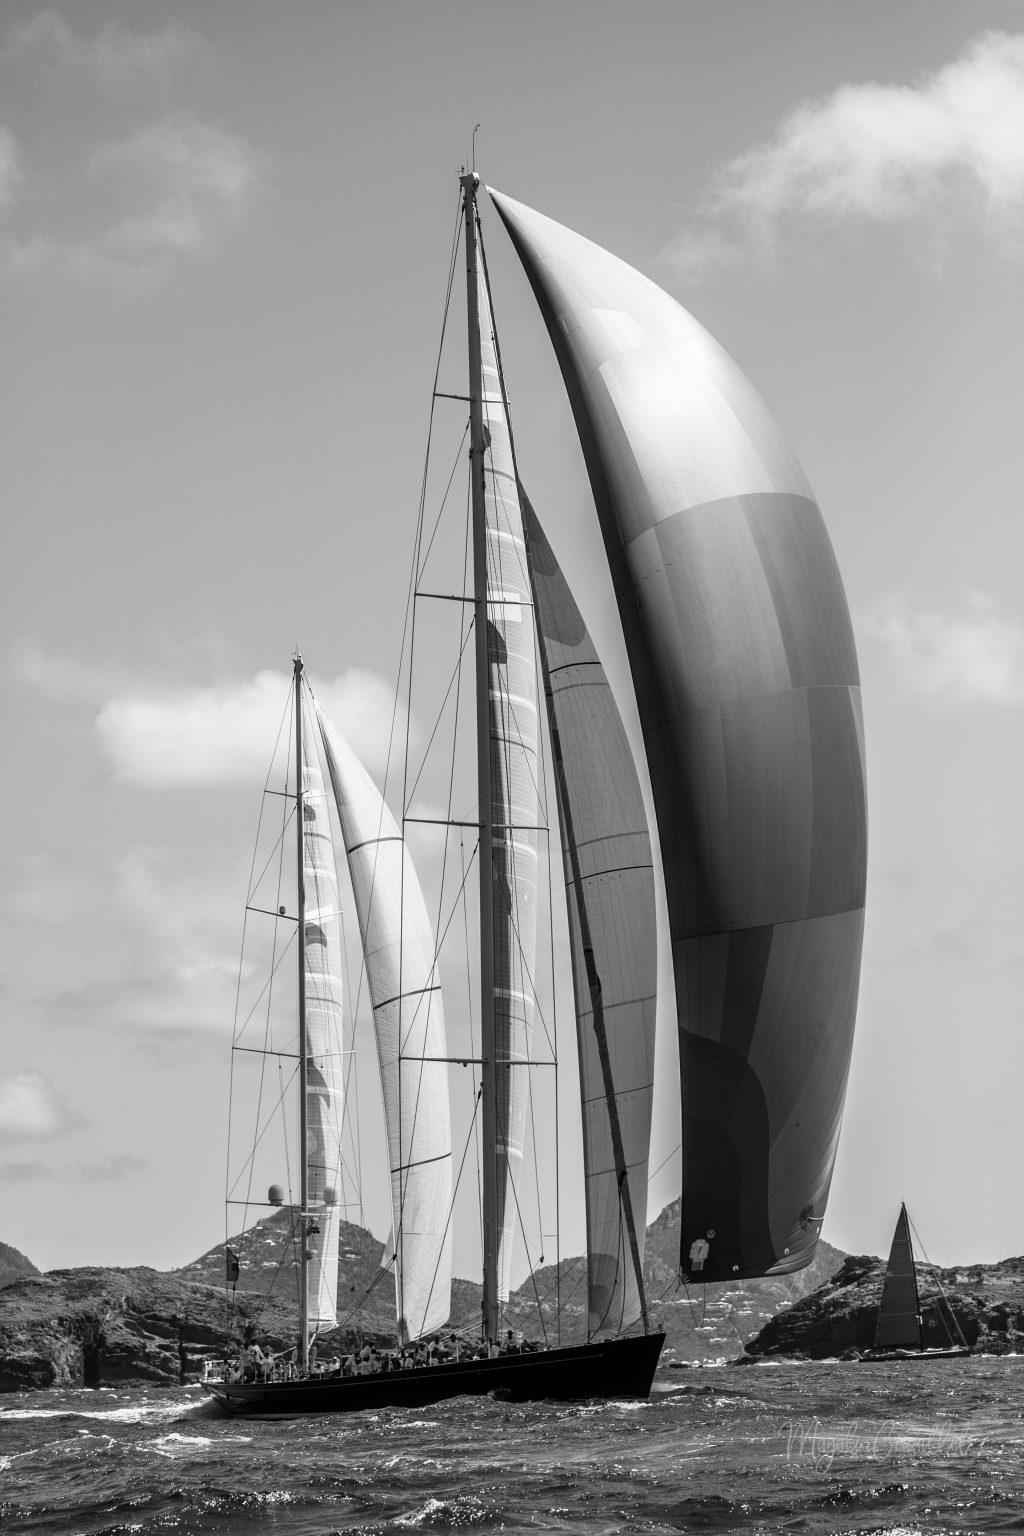 Sail Yacht, Bucket Regatta 2019 St Barths-16